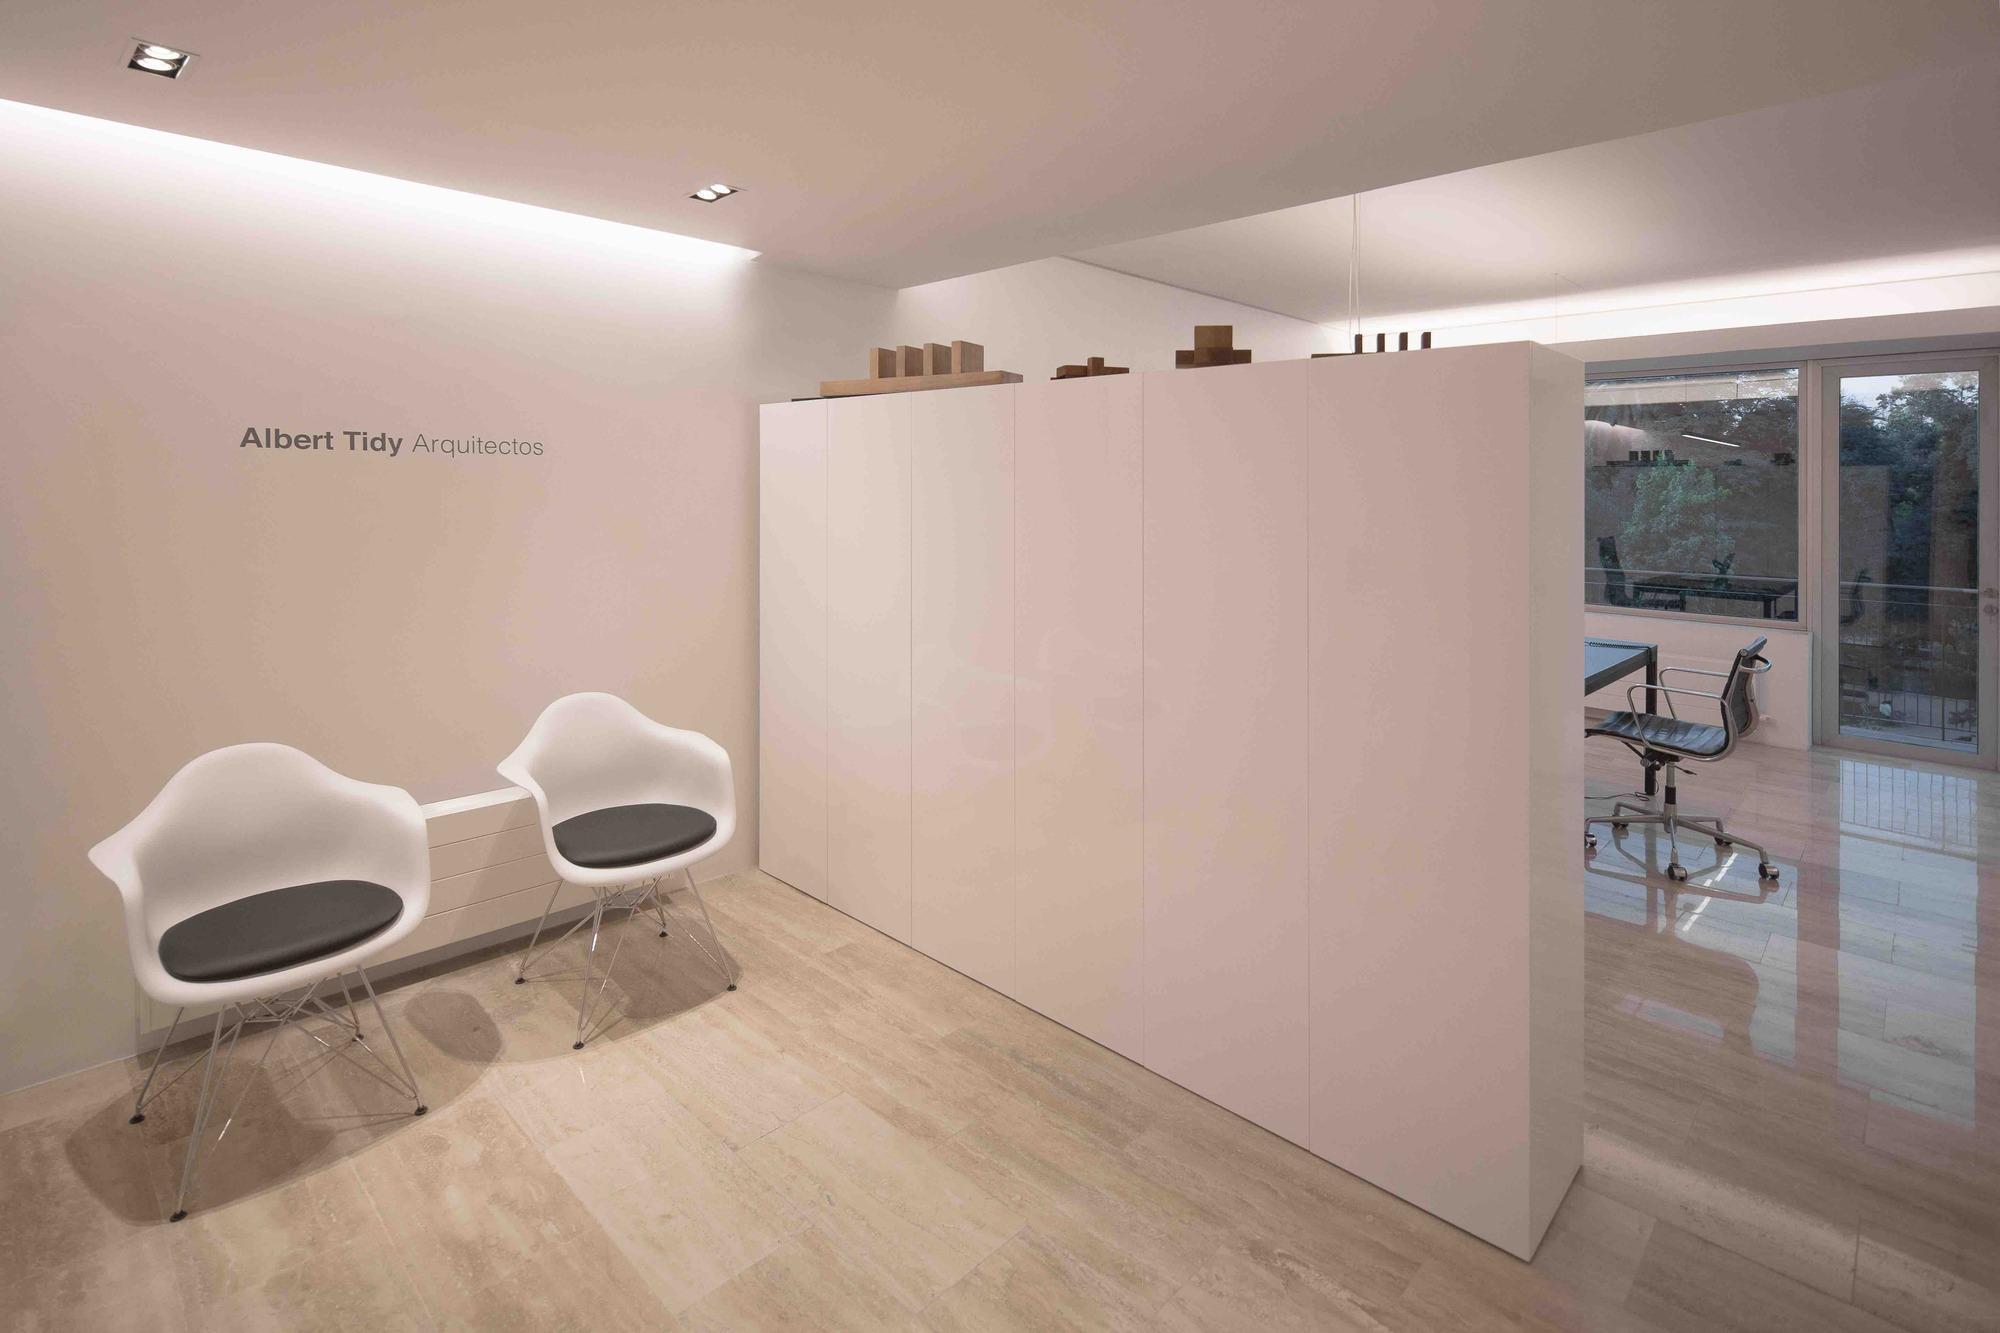 Galer a de oficinas albert tidy arquitectos albert tidy - Arquitectos madrid 2 0 ...